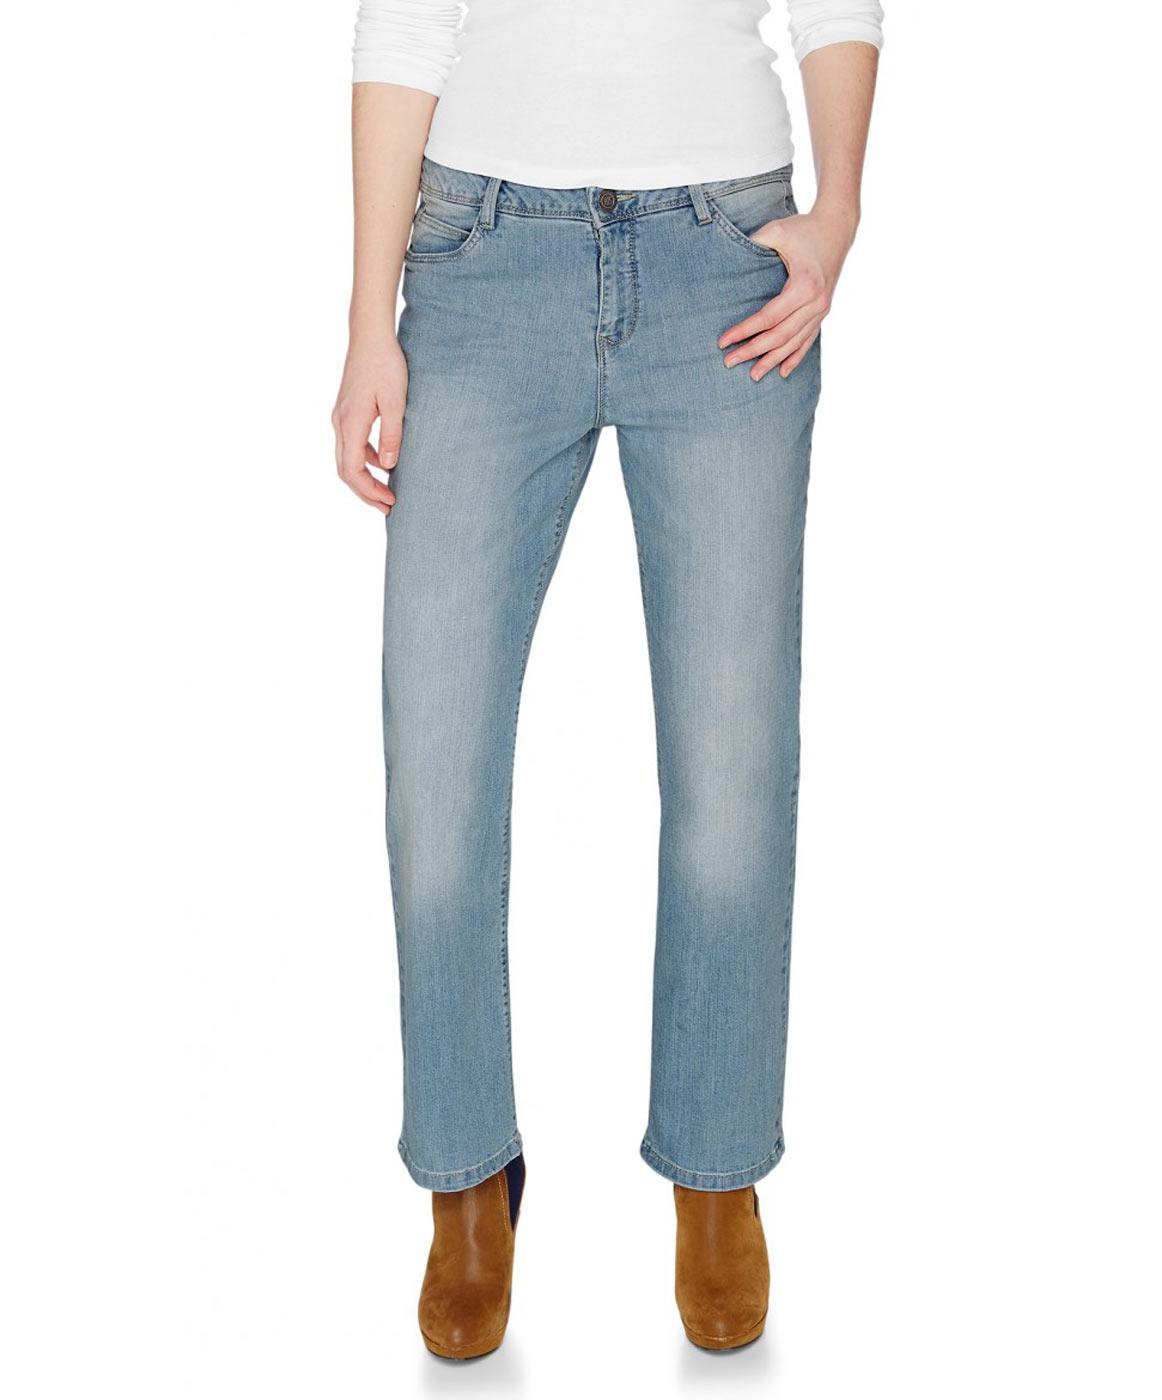 Hosen für Frauen - HIS COLETTA Jeans Comfort Fit Powder Blue  - Onlineshop Jeans Meile